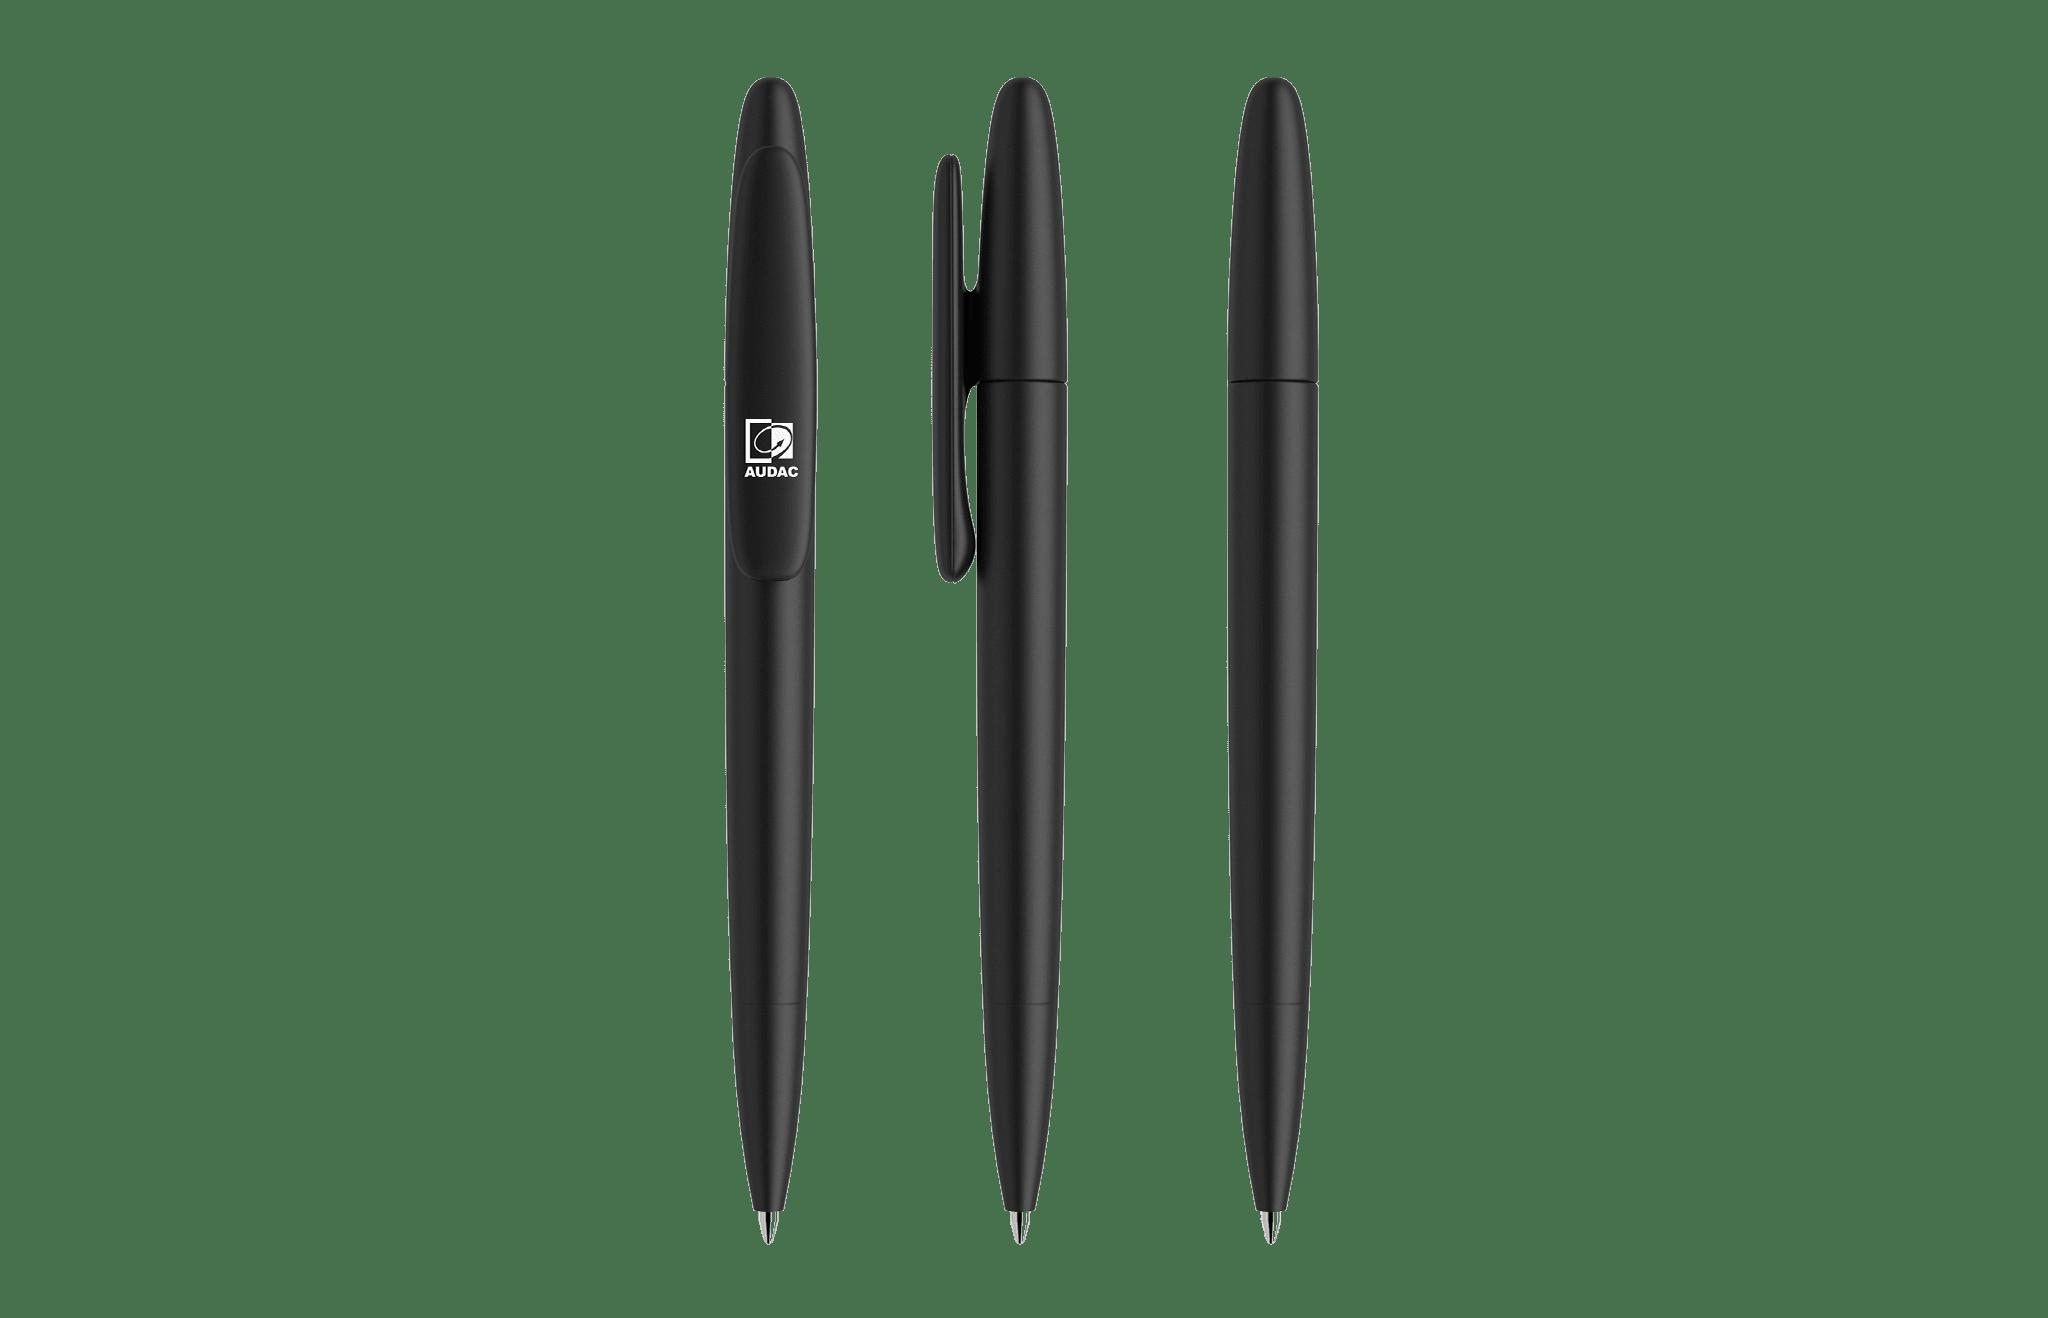 PROMO5521 - AUDAC twist ballpoint